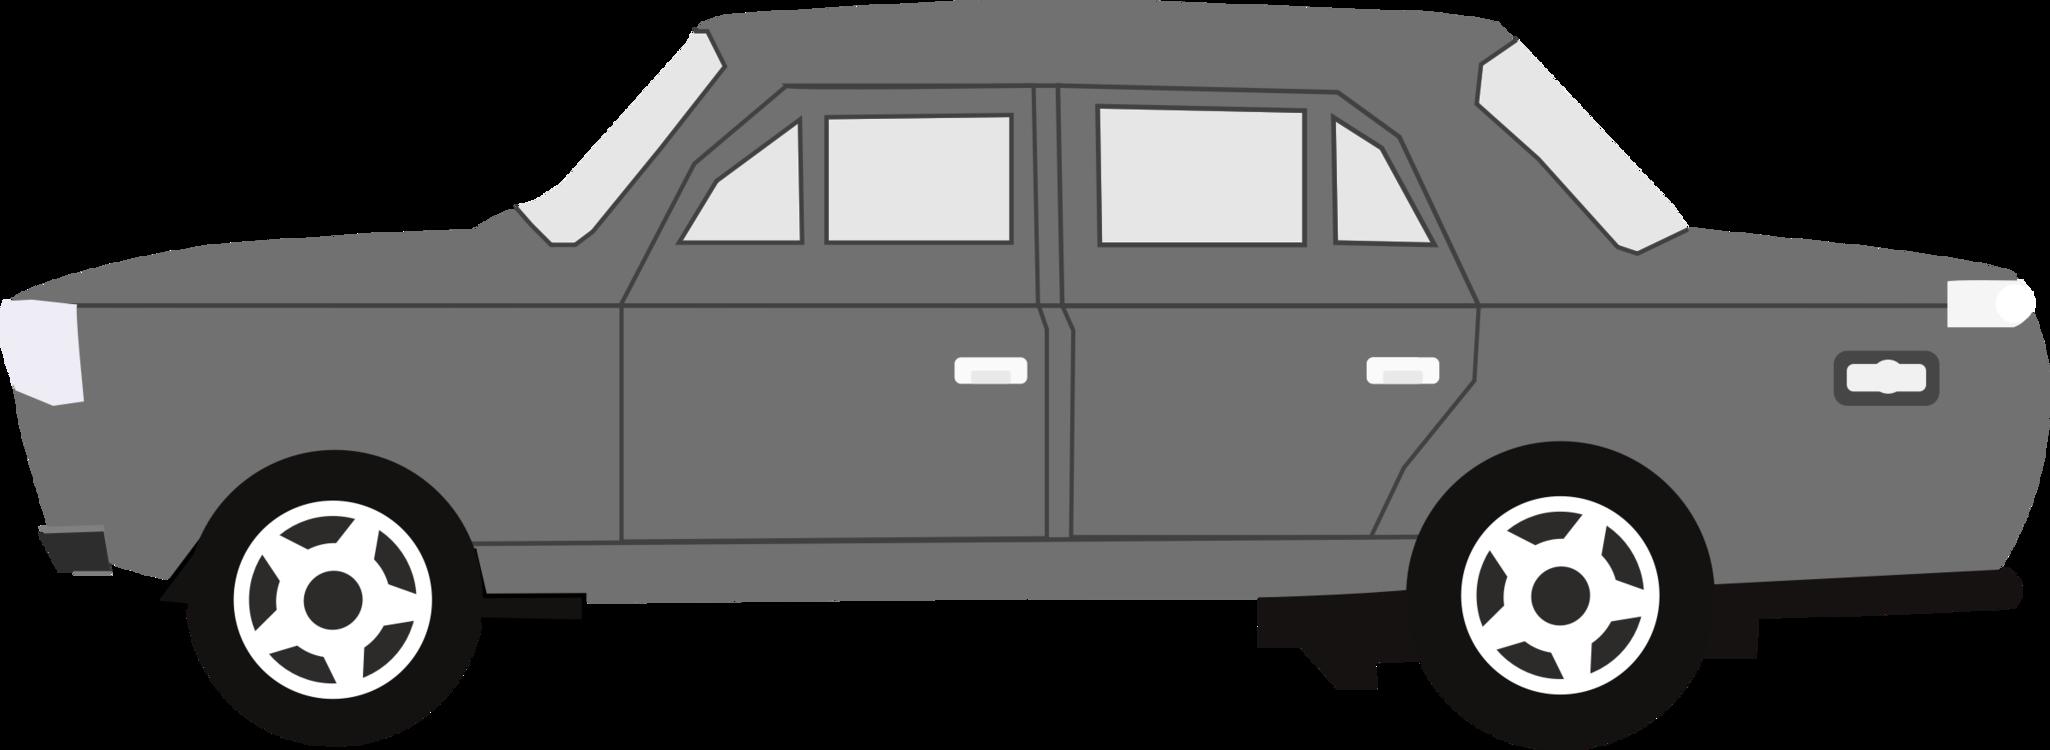 Family Car,Classic Car,Van